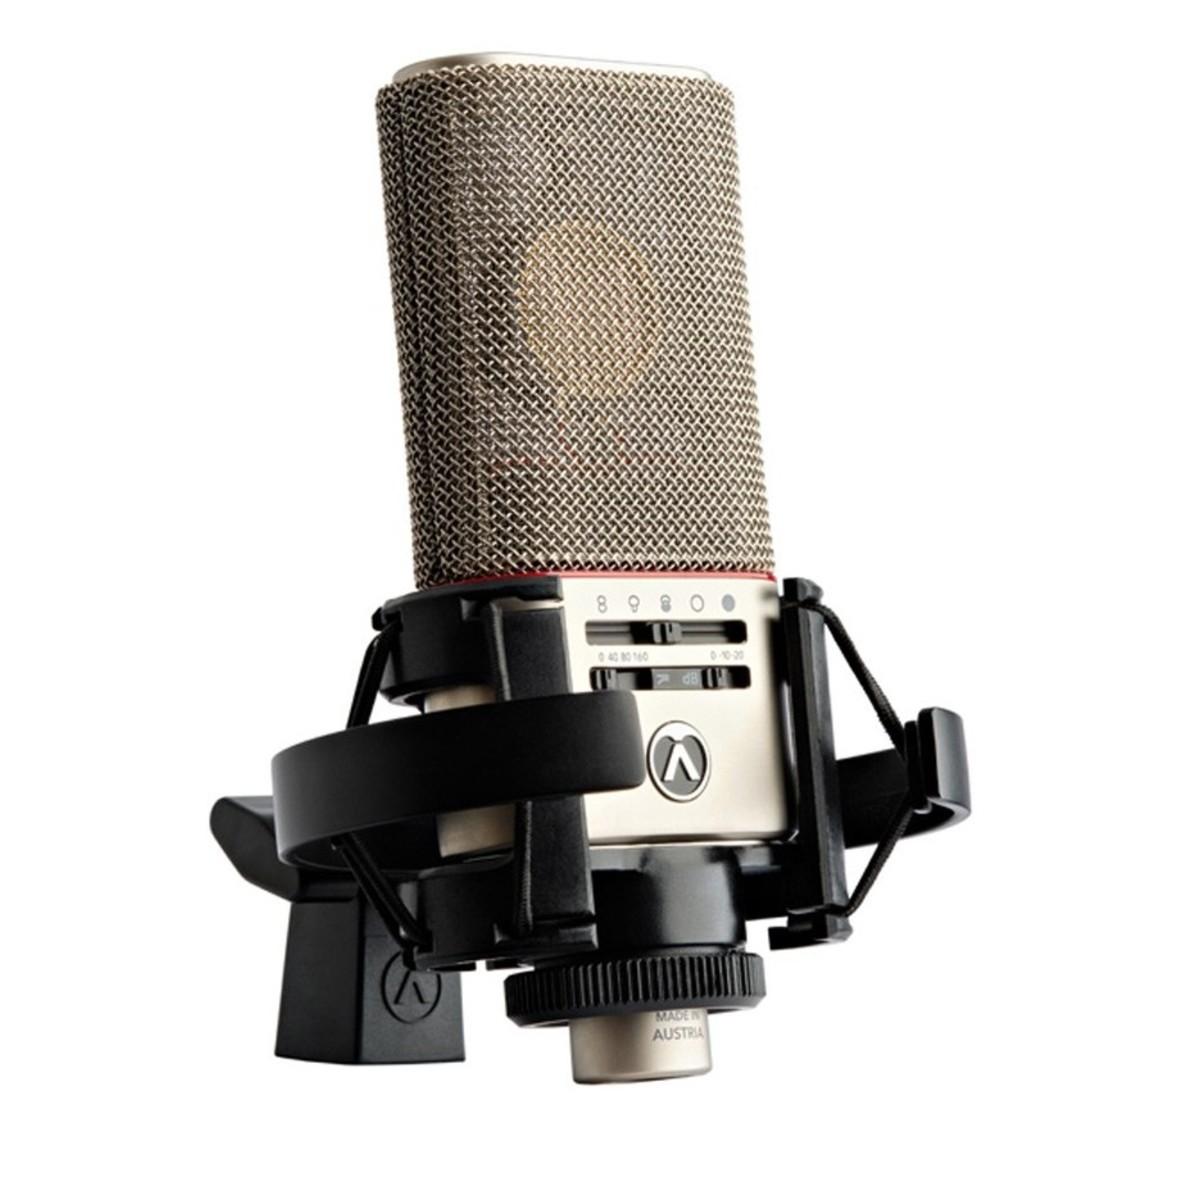 Austrian Audio OC818 Condenser Mic Studio Set, Limited Edition